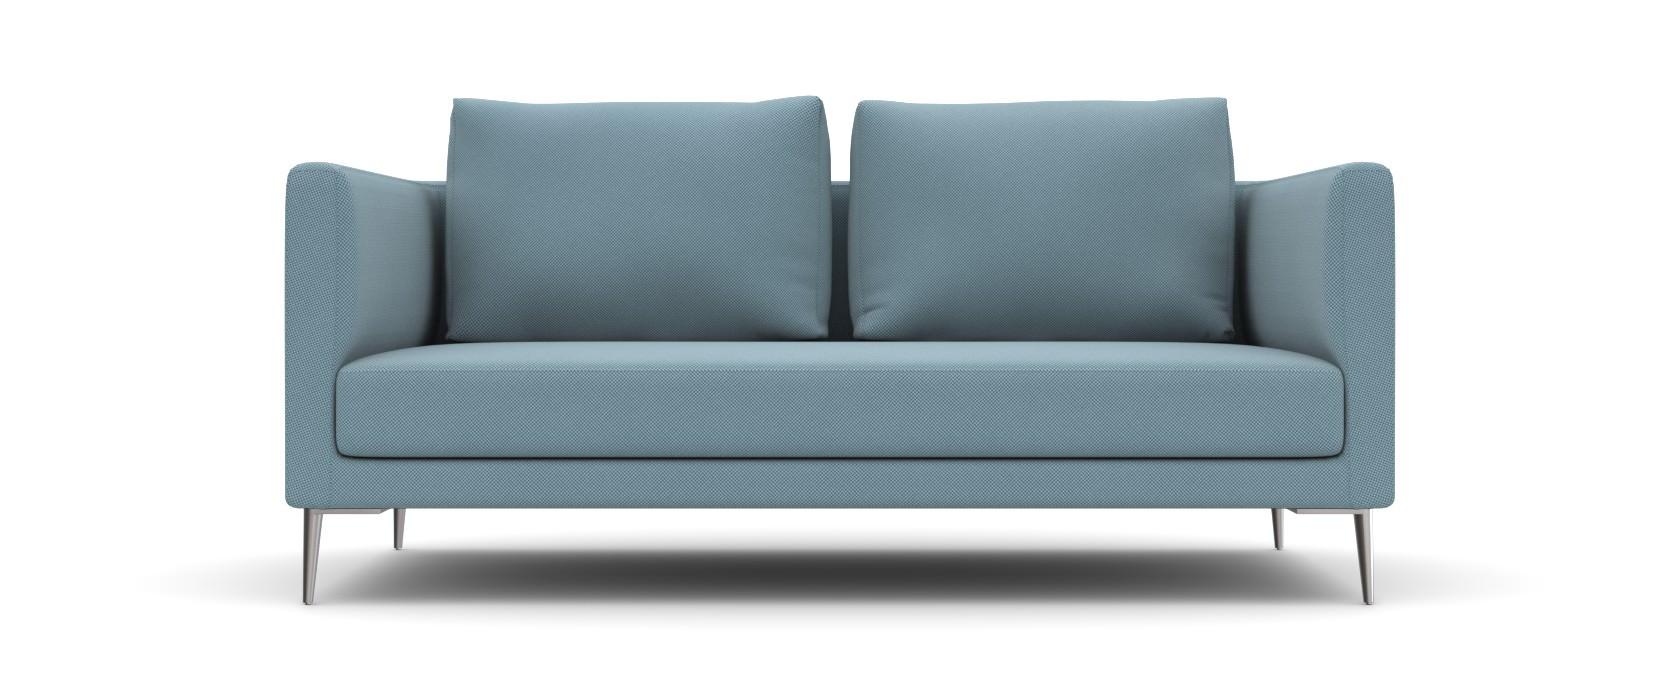 Двухместный диван Augusto